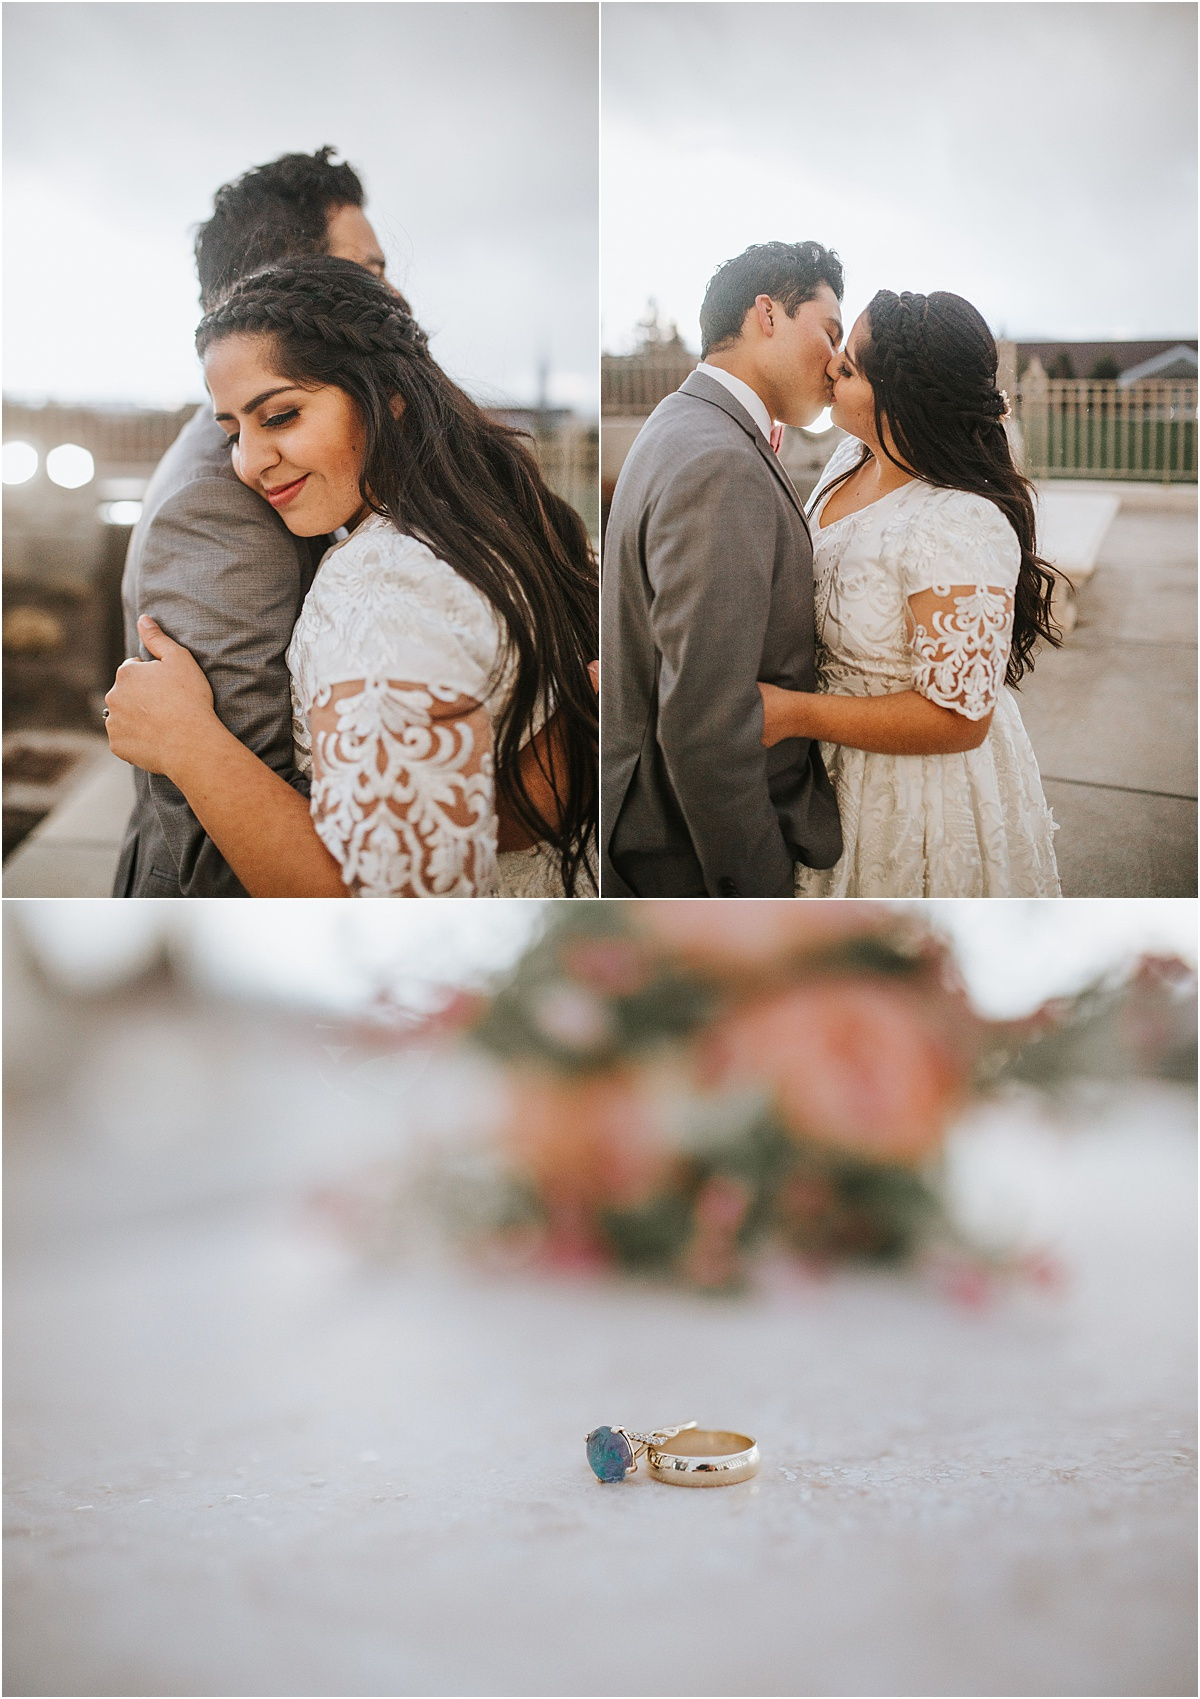 rexburg_temple_wedding_bridal_session_winter_bride_dress_groom_0037.jpg